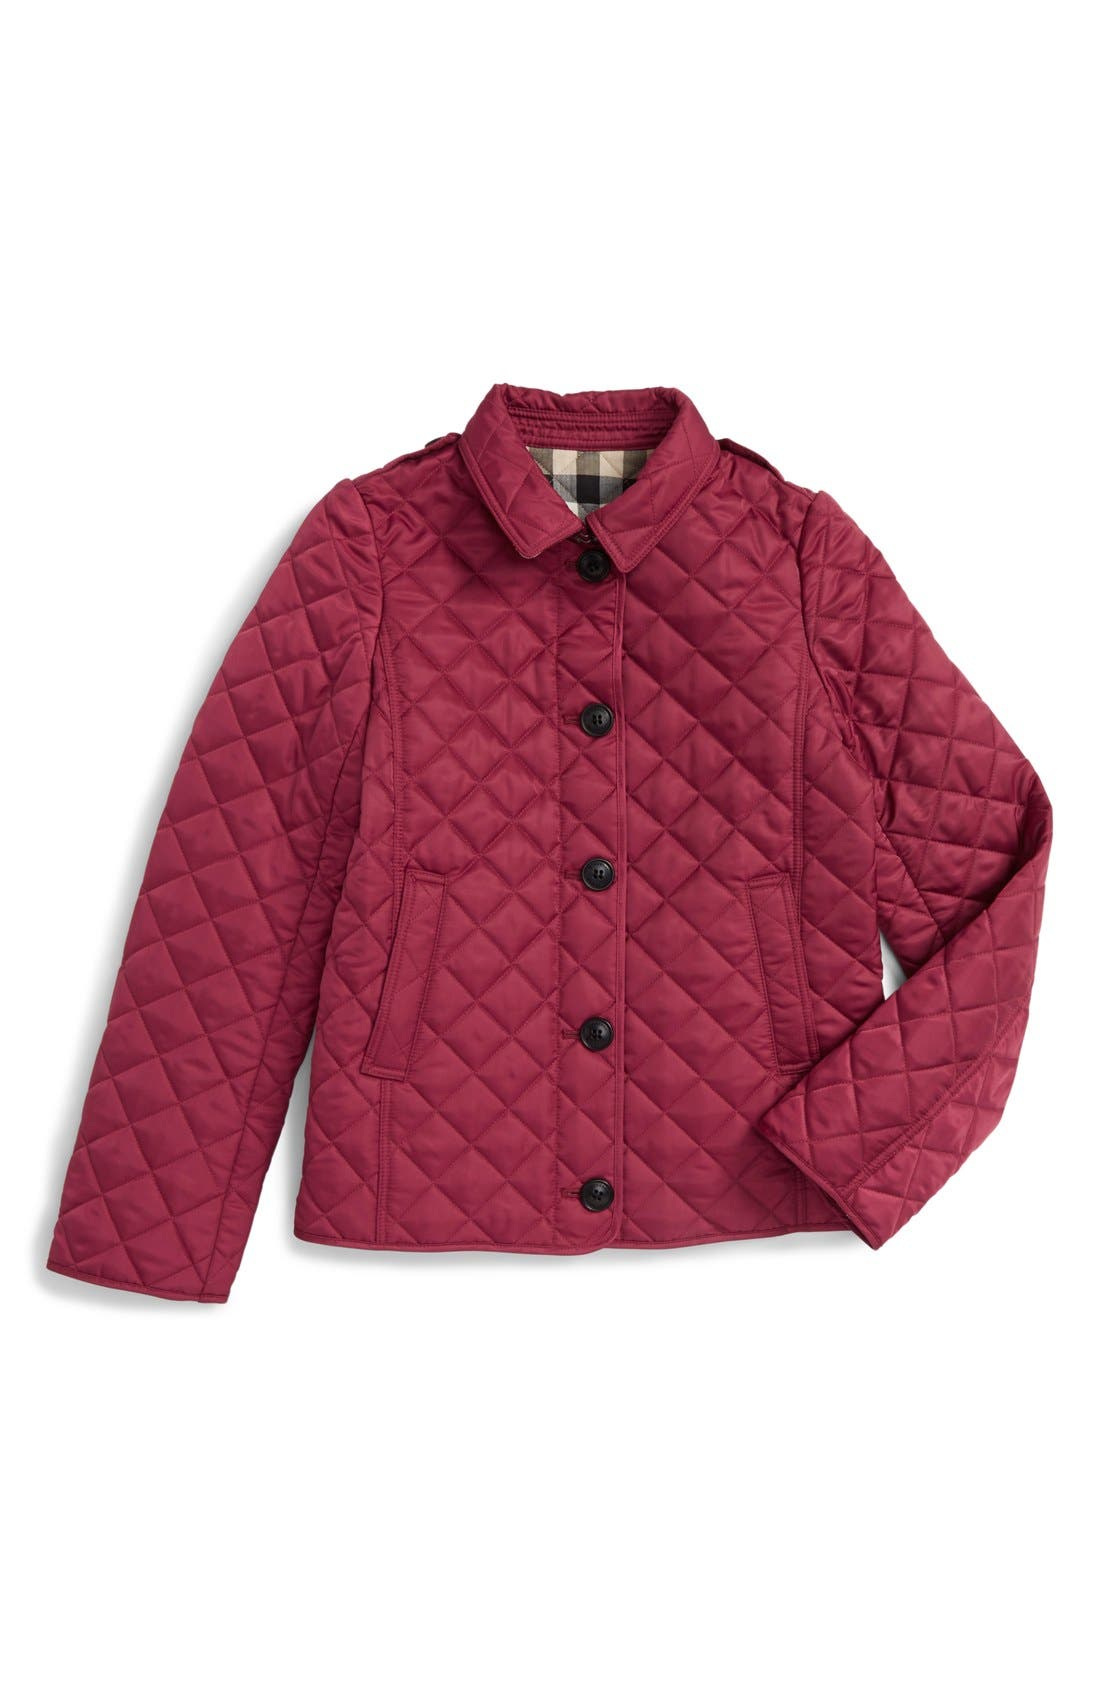 Burberry 'MiniAshurst' Quilted Jacket (Big Girls & Little Girls)